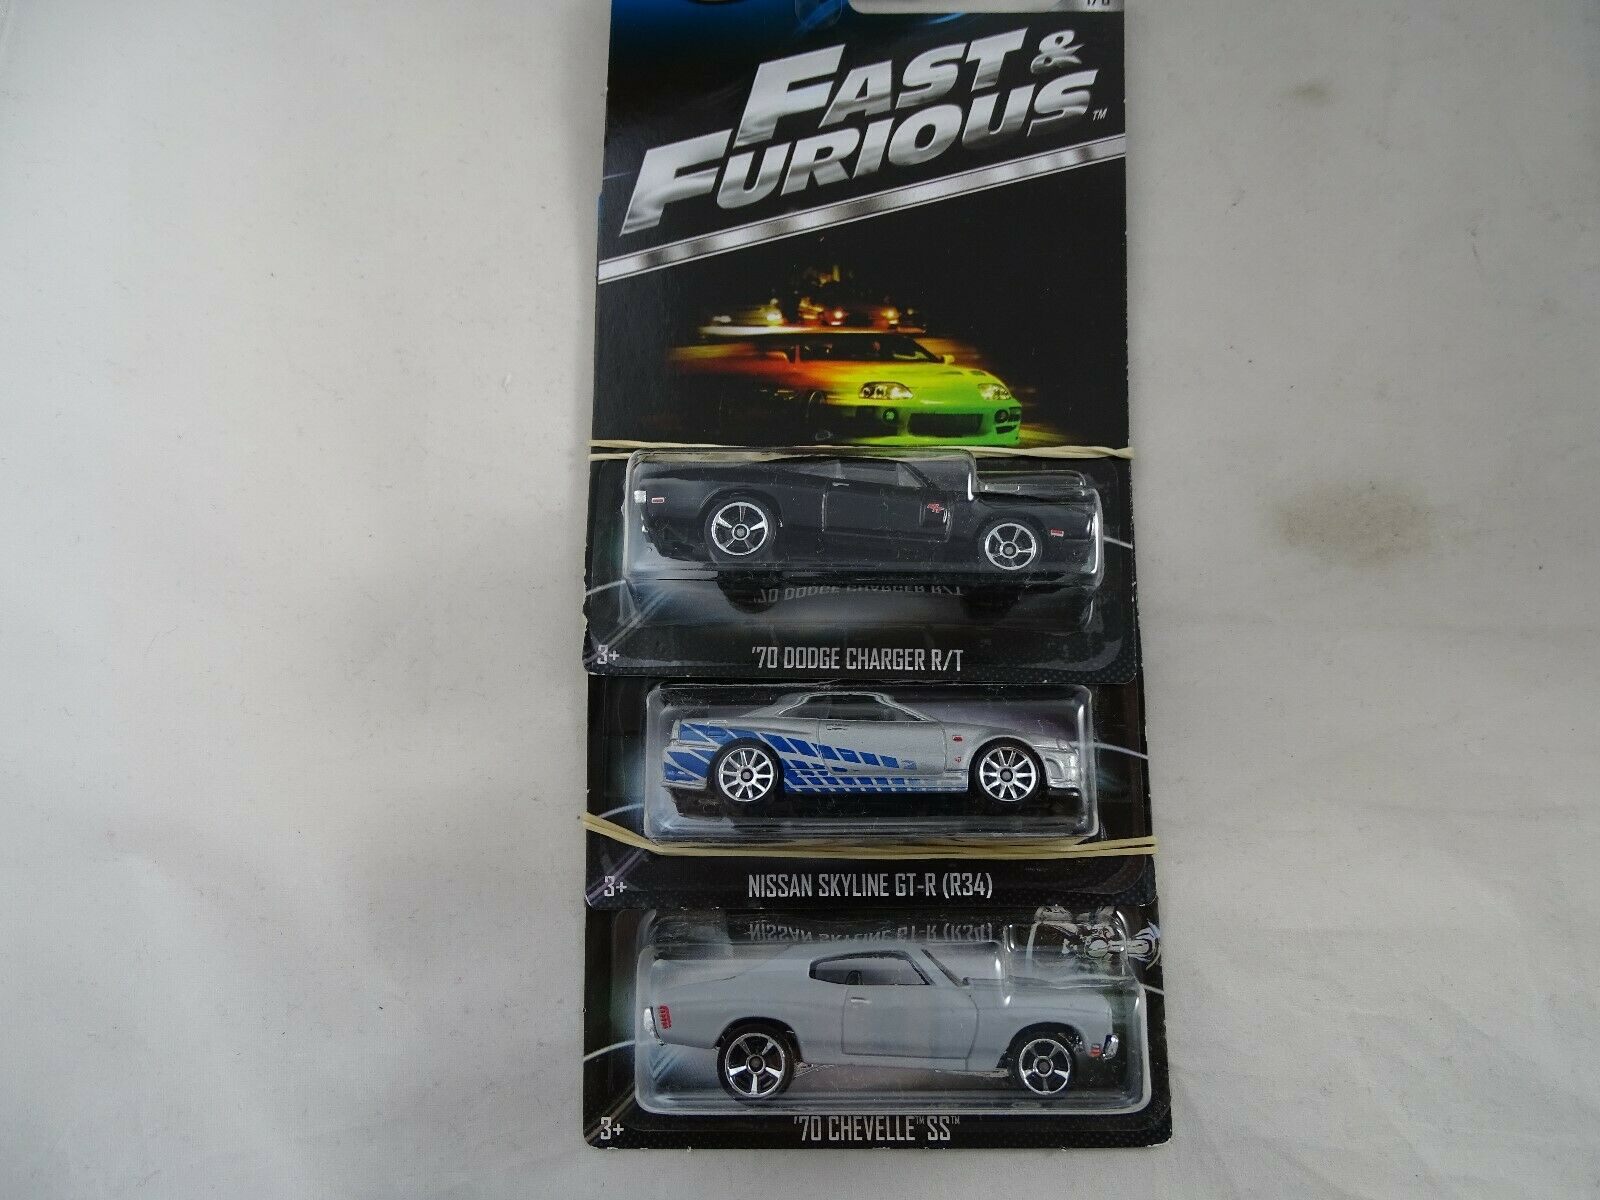 1 64 HOT WHEELS 3er Set Fast & Furious DODGE CHARGER-Nissan Skyline-Chevelle SS